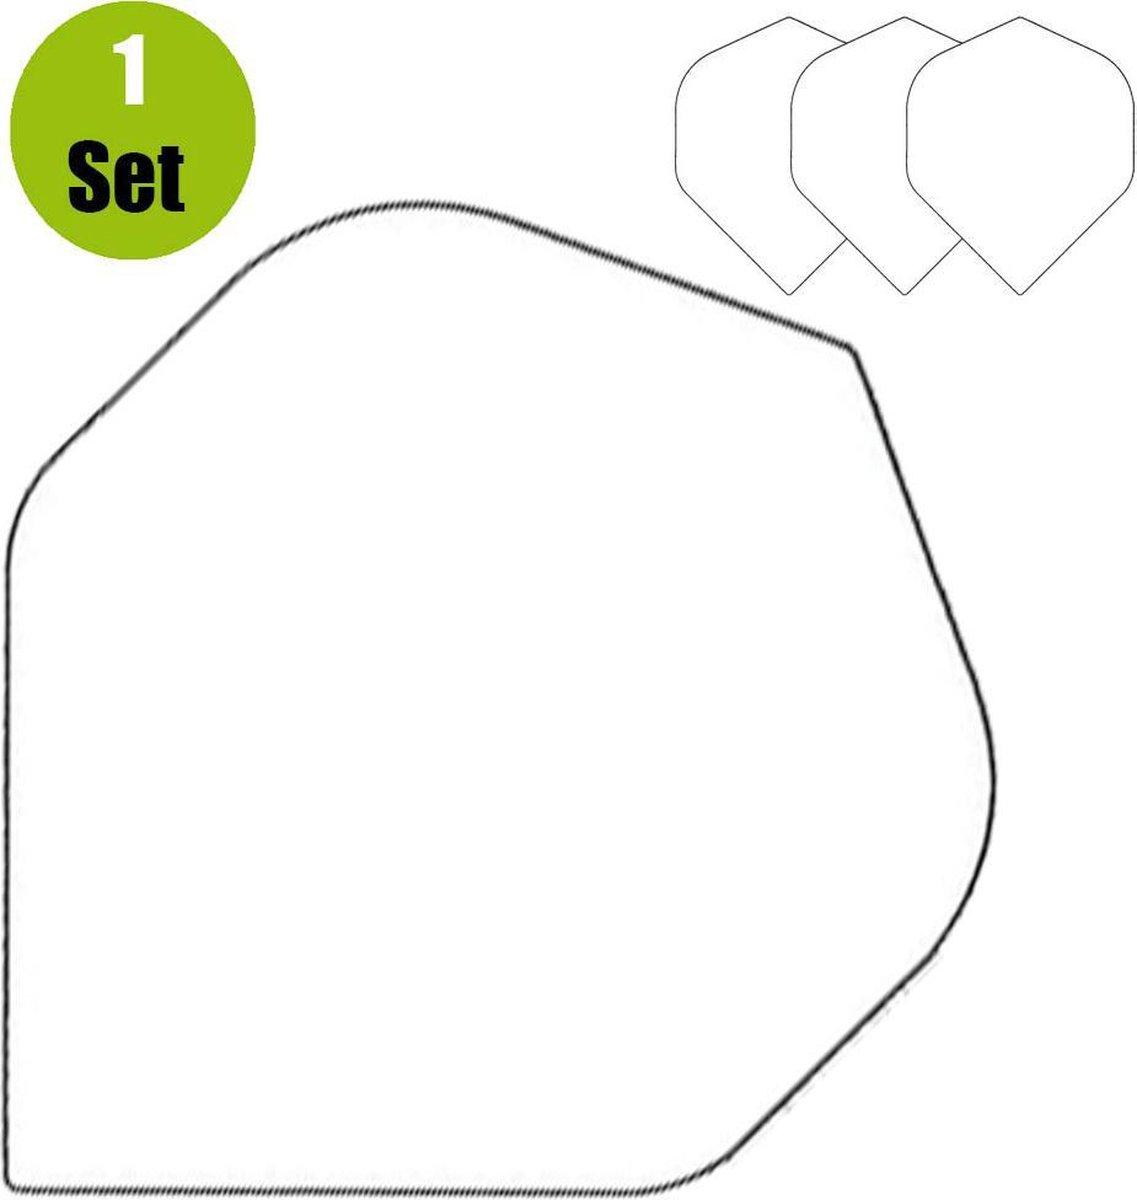 Poly Plain Dartflights - Wit- (1 Set)